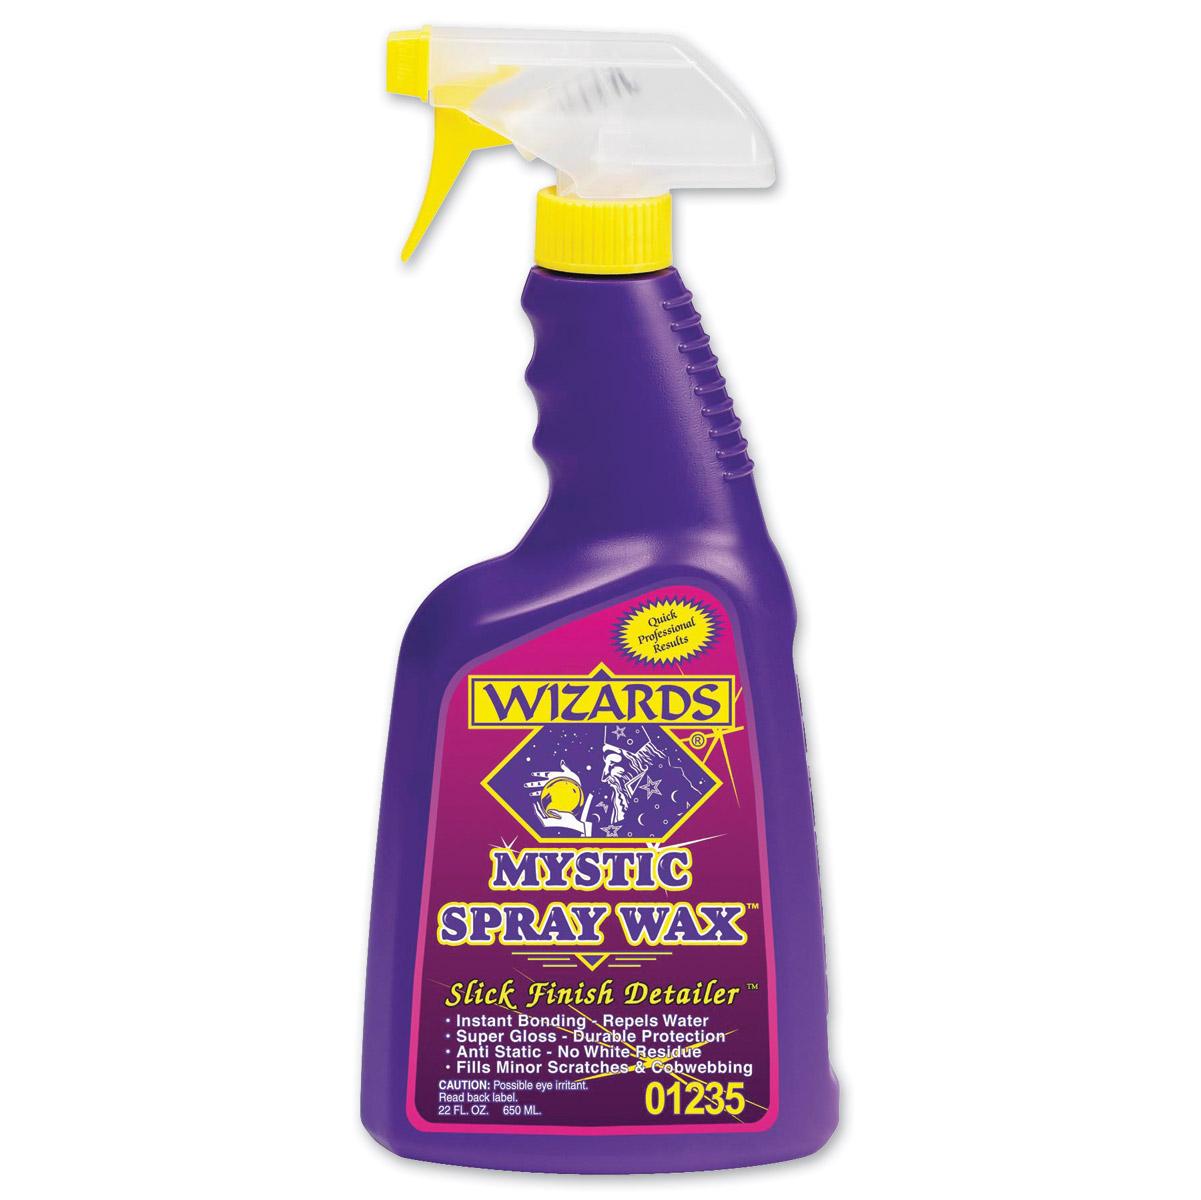 Wizards Mystic Spray Wax Slick Finish Detailer